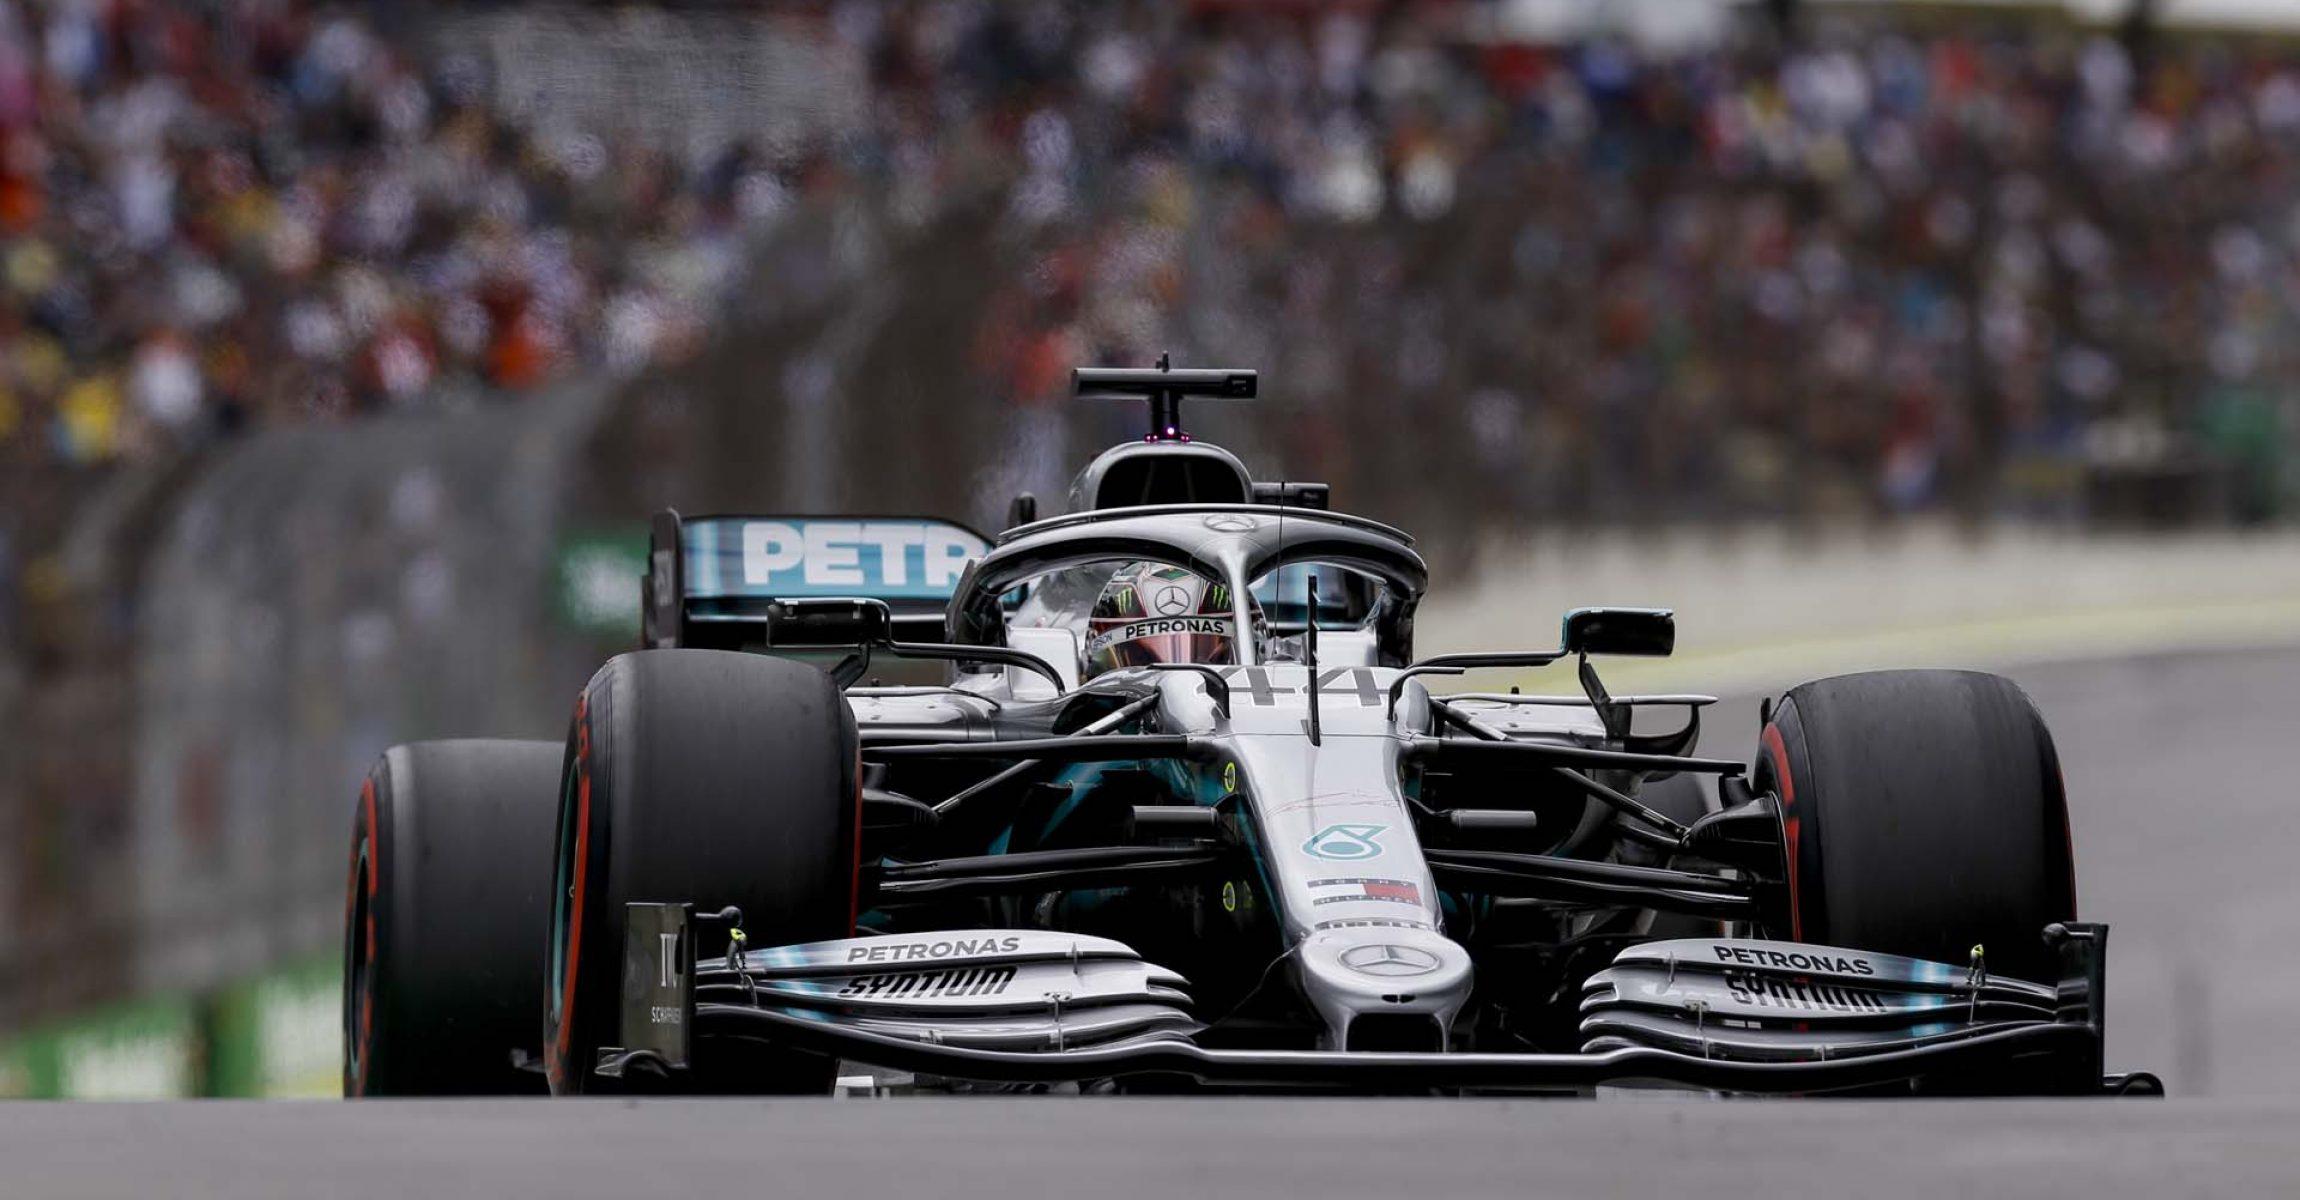 2019 Brazilian Grand Prix, Saturday - Wolfgang Wilhelm Lewis Hamilton Mercedes